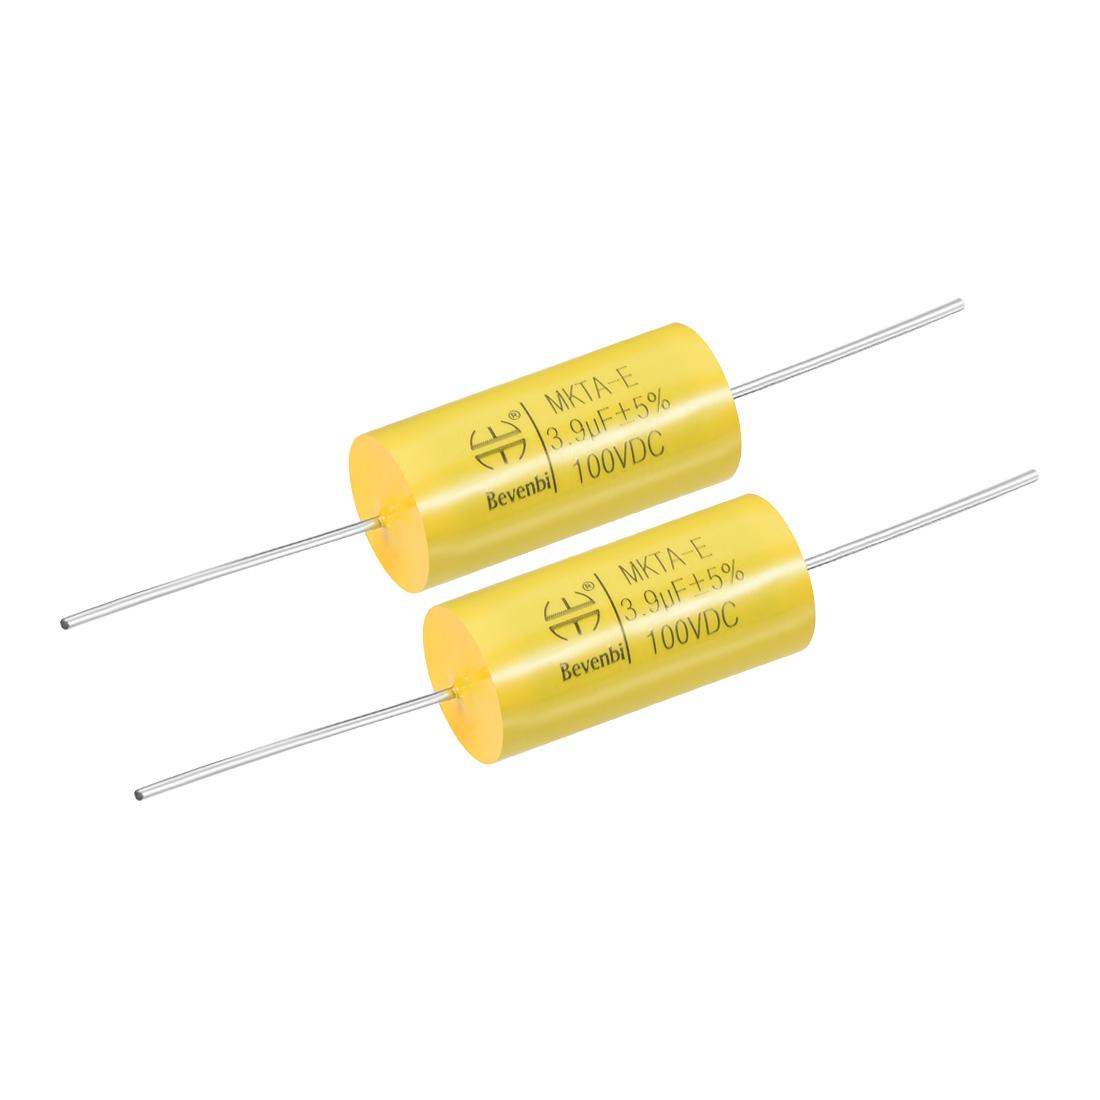 Film Capacitor 100V DC 3.9uF MKTA-E Round Polypropylene Capacitors Yellow 2pcs